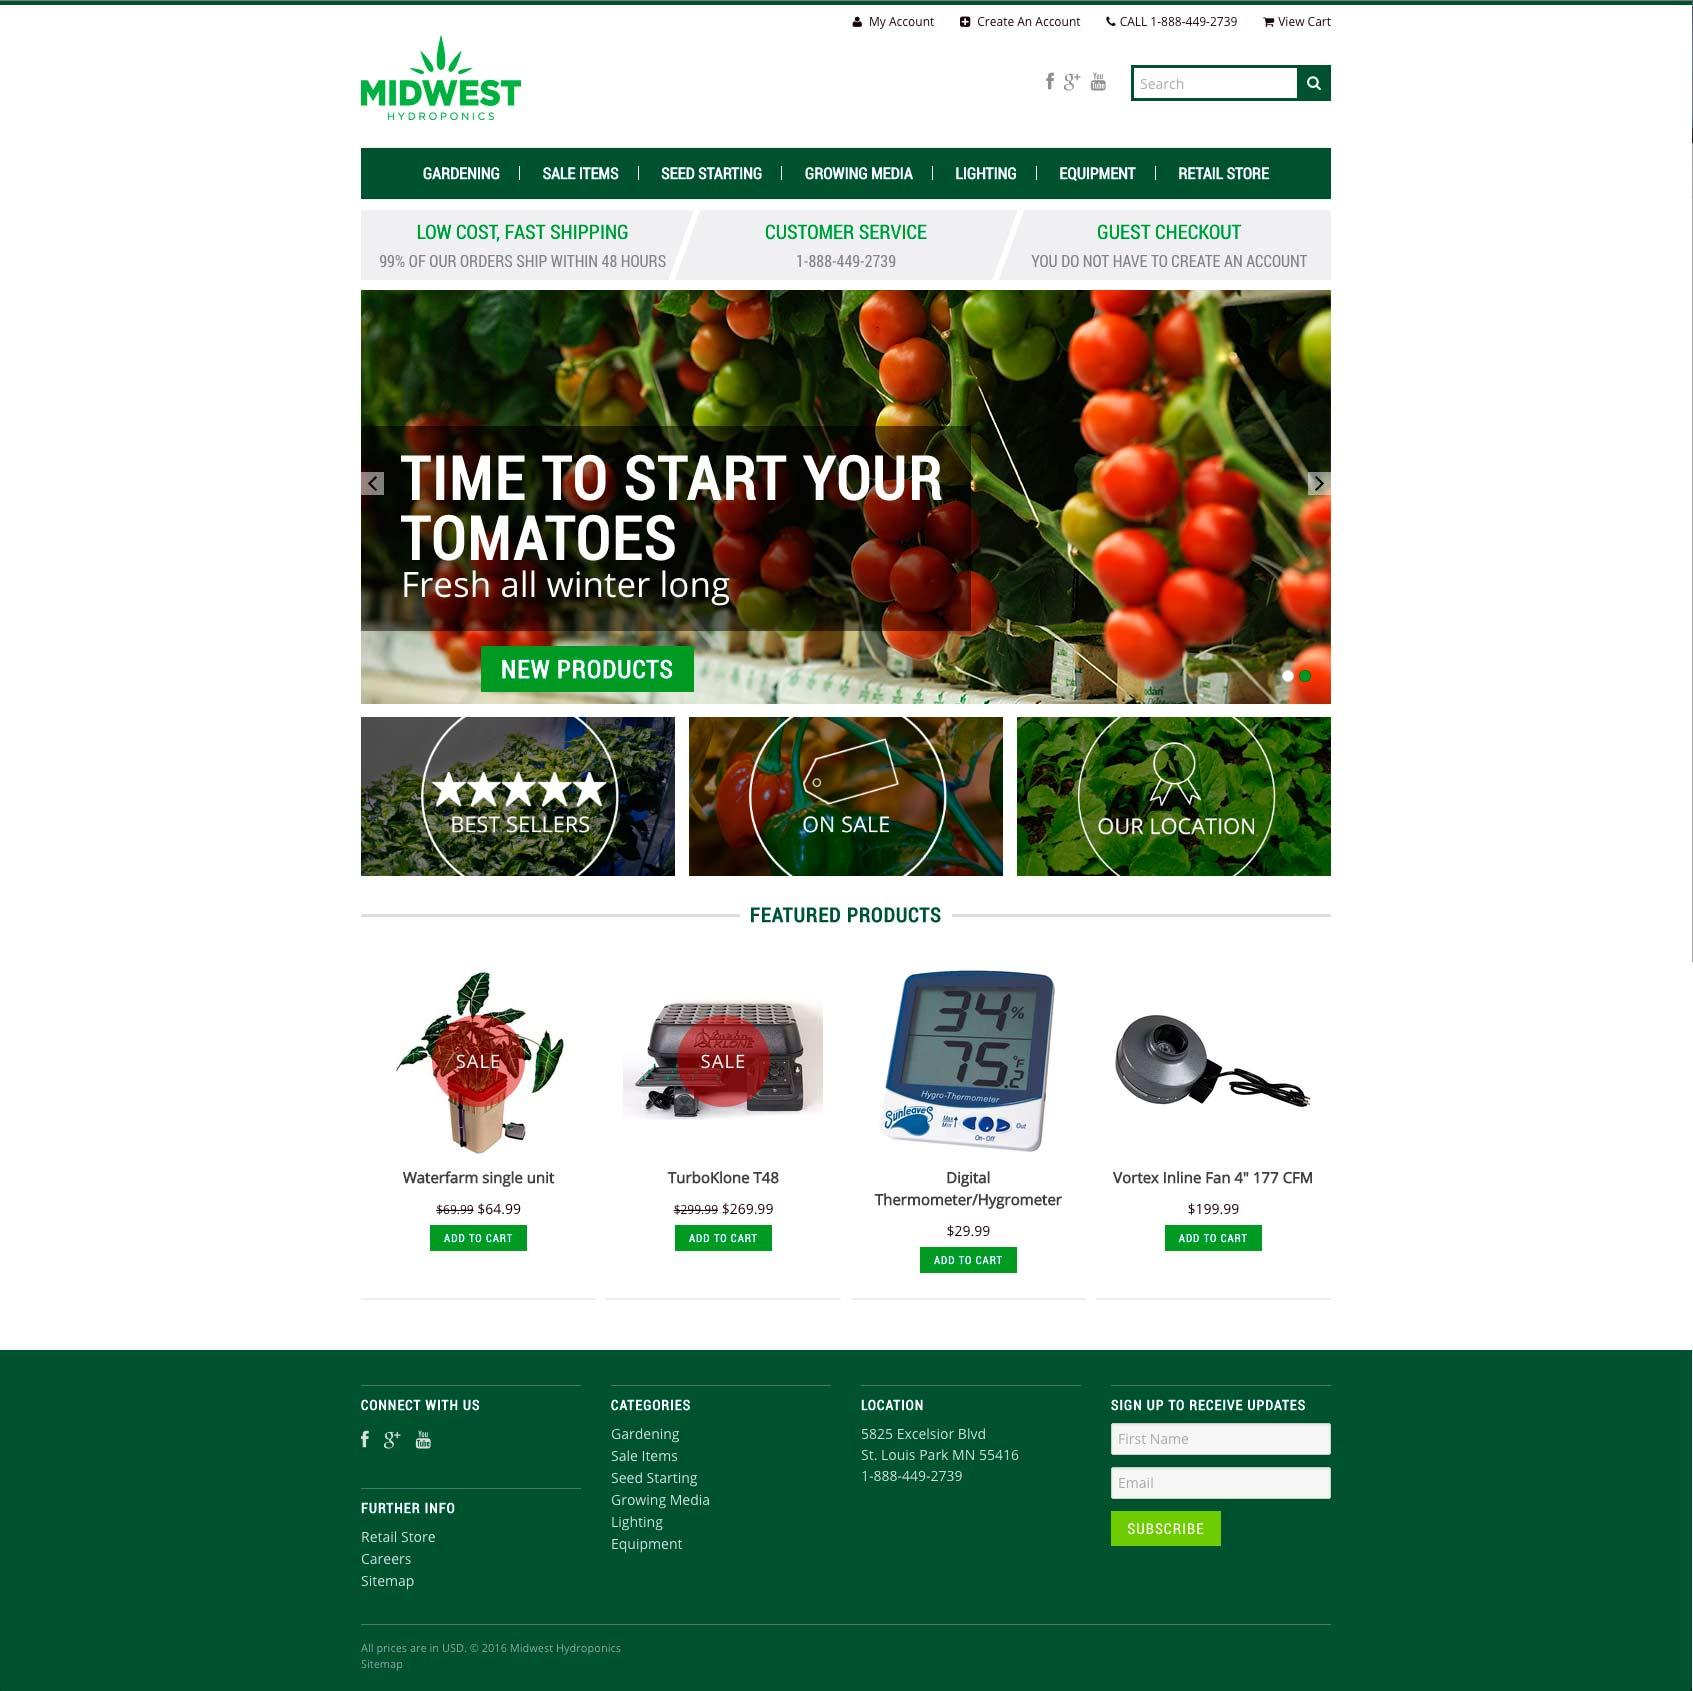 eCommerce website development, eCommerce web design